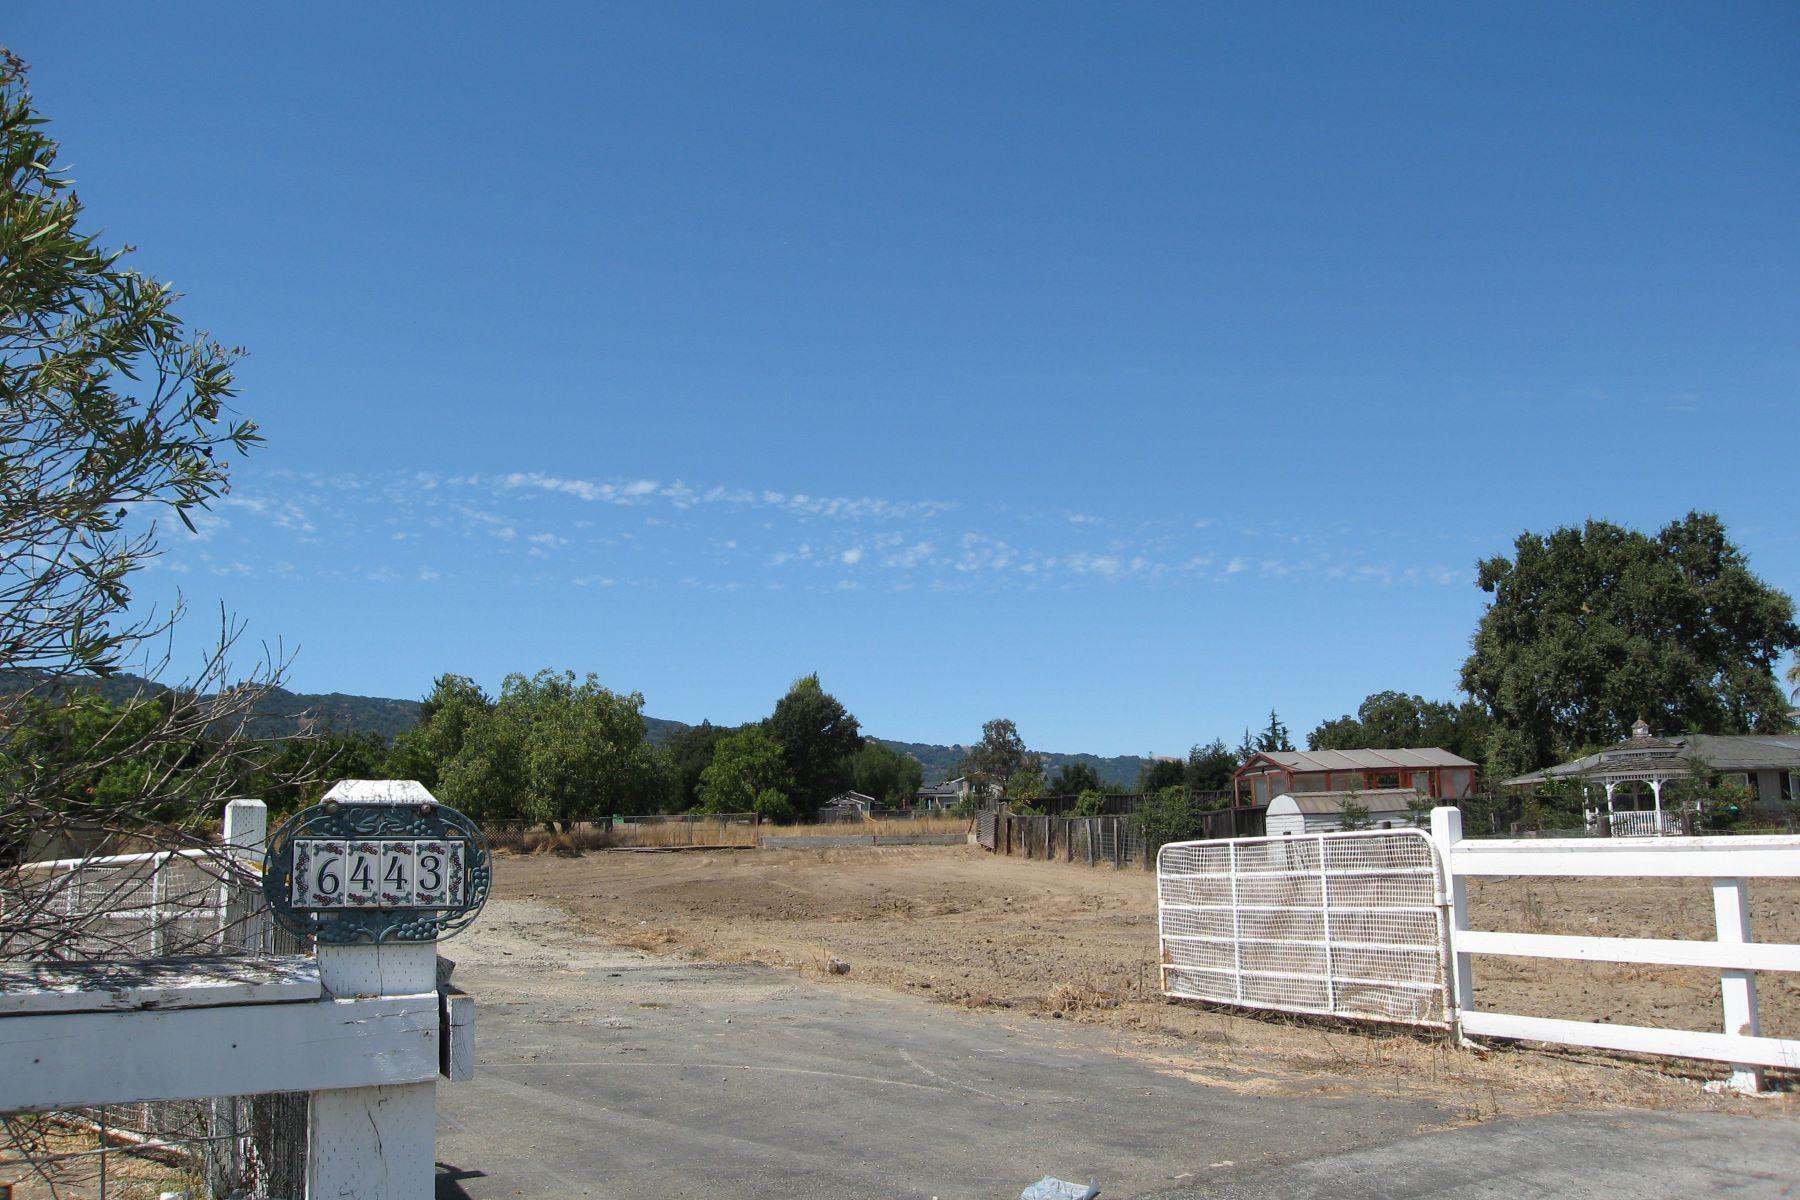 Land for Sale at 6443 Alisal Street, Pleasanton, CA 94566 6443 Alisal Street Pleasanton, California 94566 United States